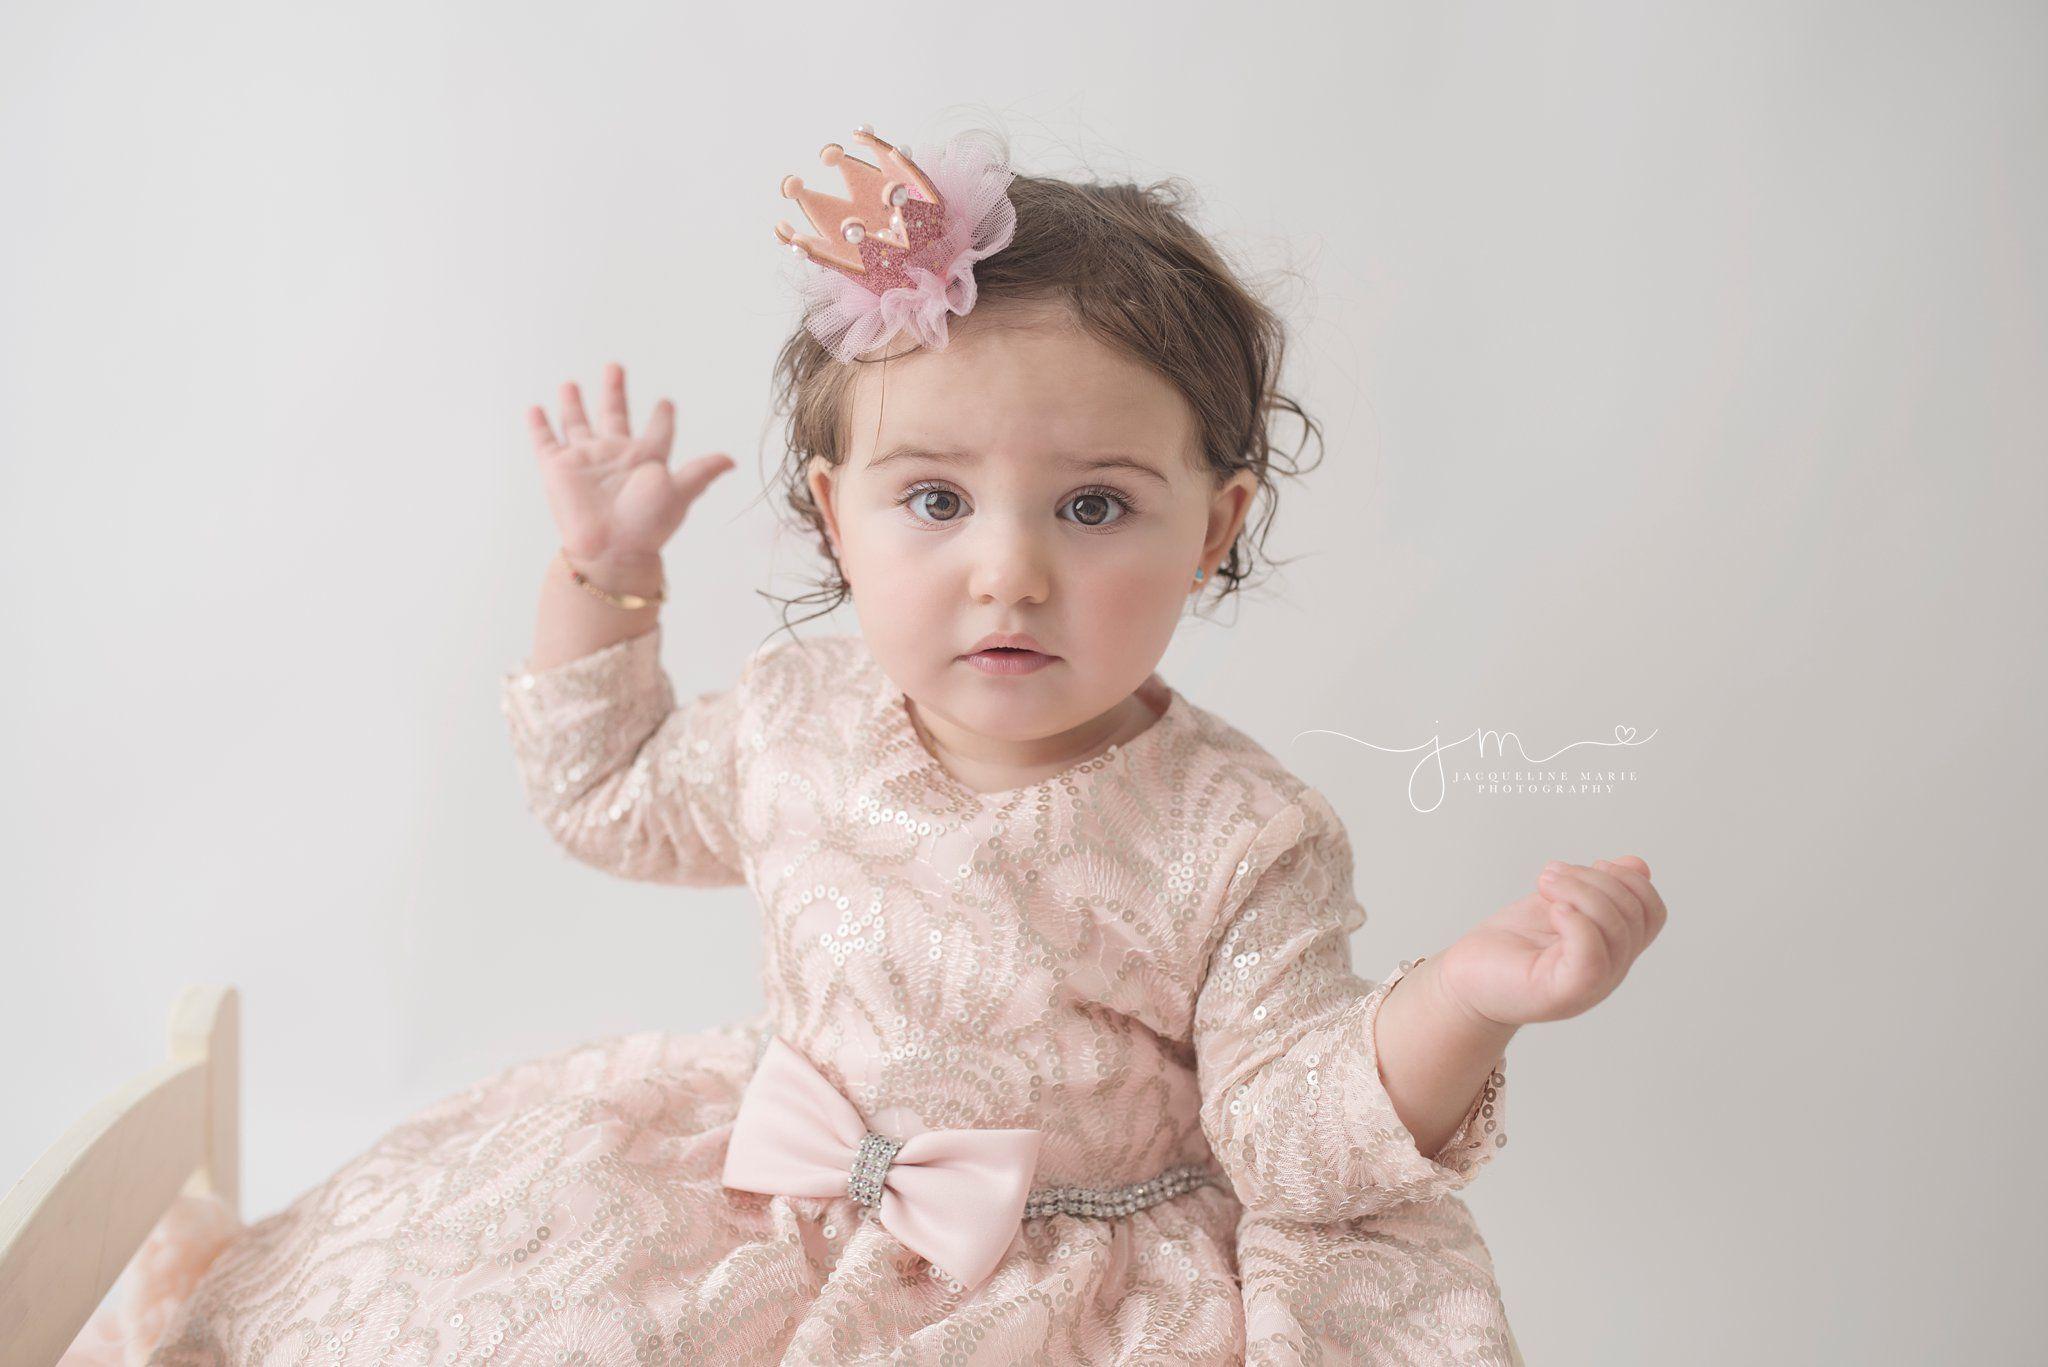 Baby Photographer Columbus Ohio Birthday cake smash Cake smash